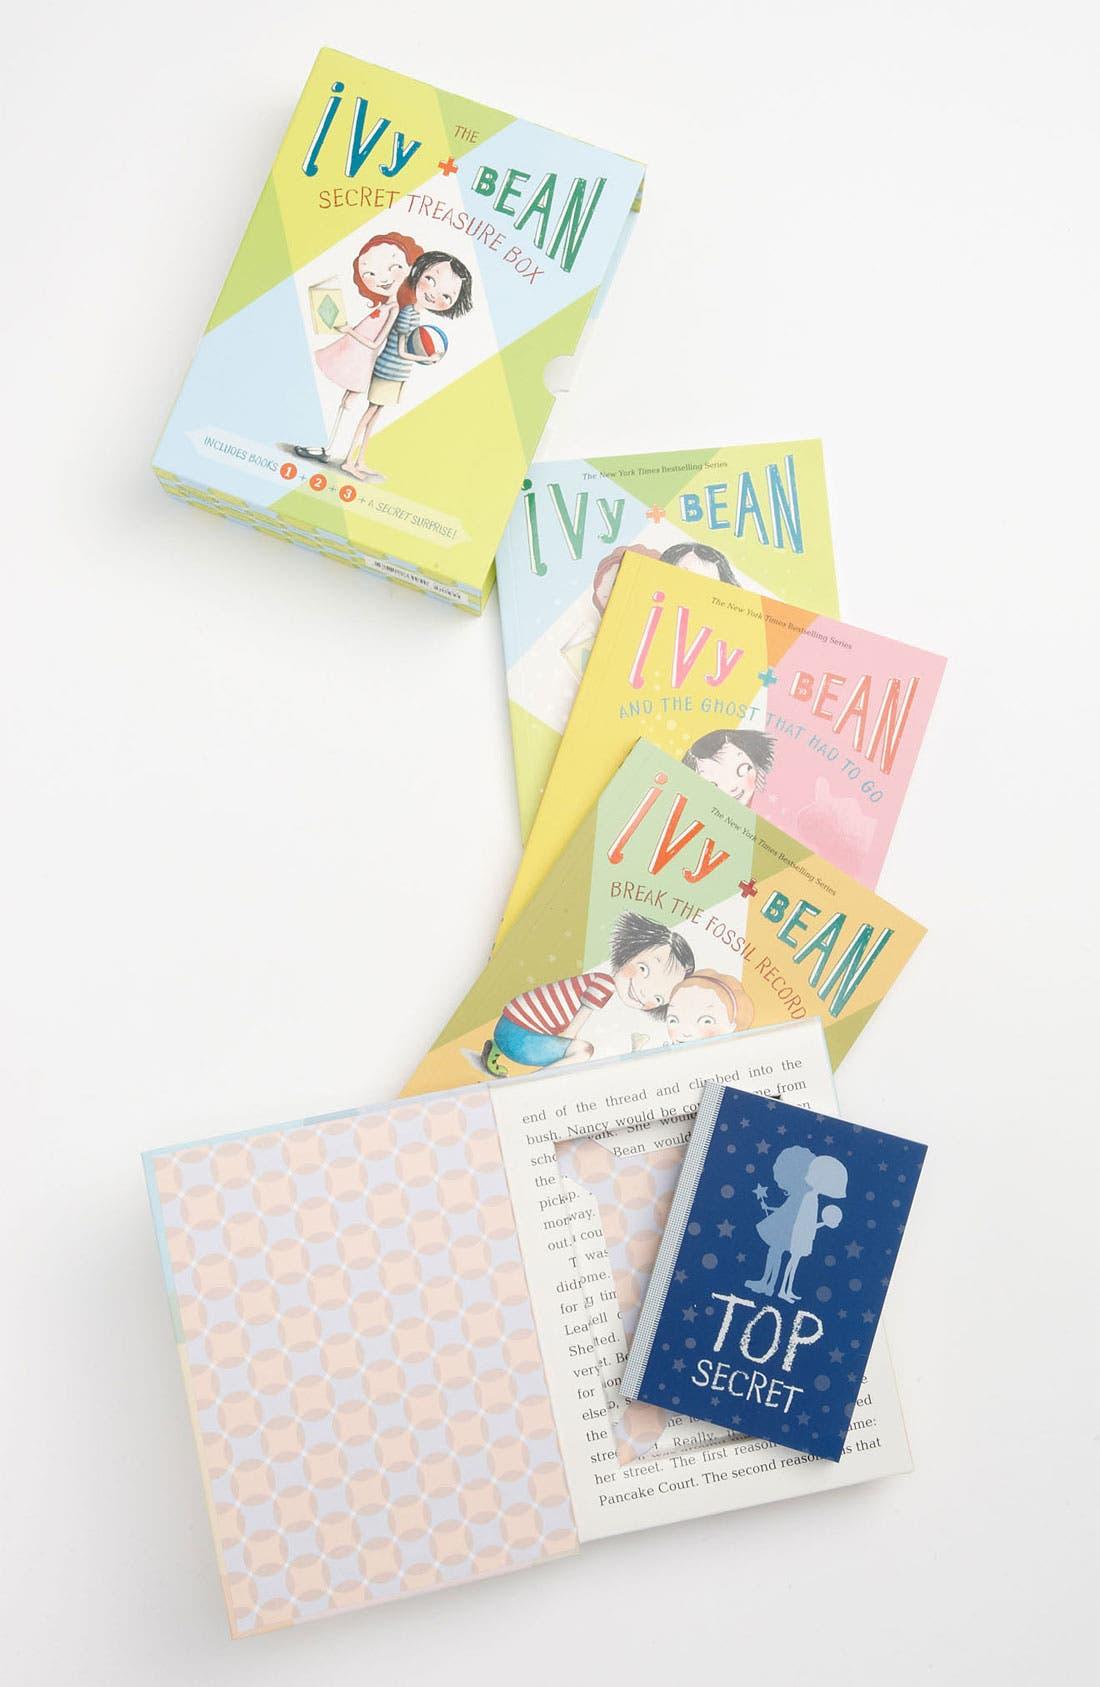 Alternate Image 2  - Annie Barrows & Sophie Blackall 'Ivy + Bean' Secret Treasure Box Set